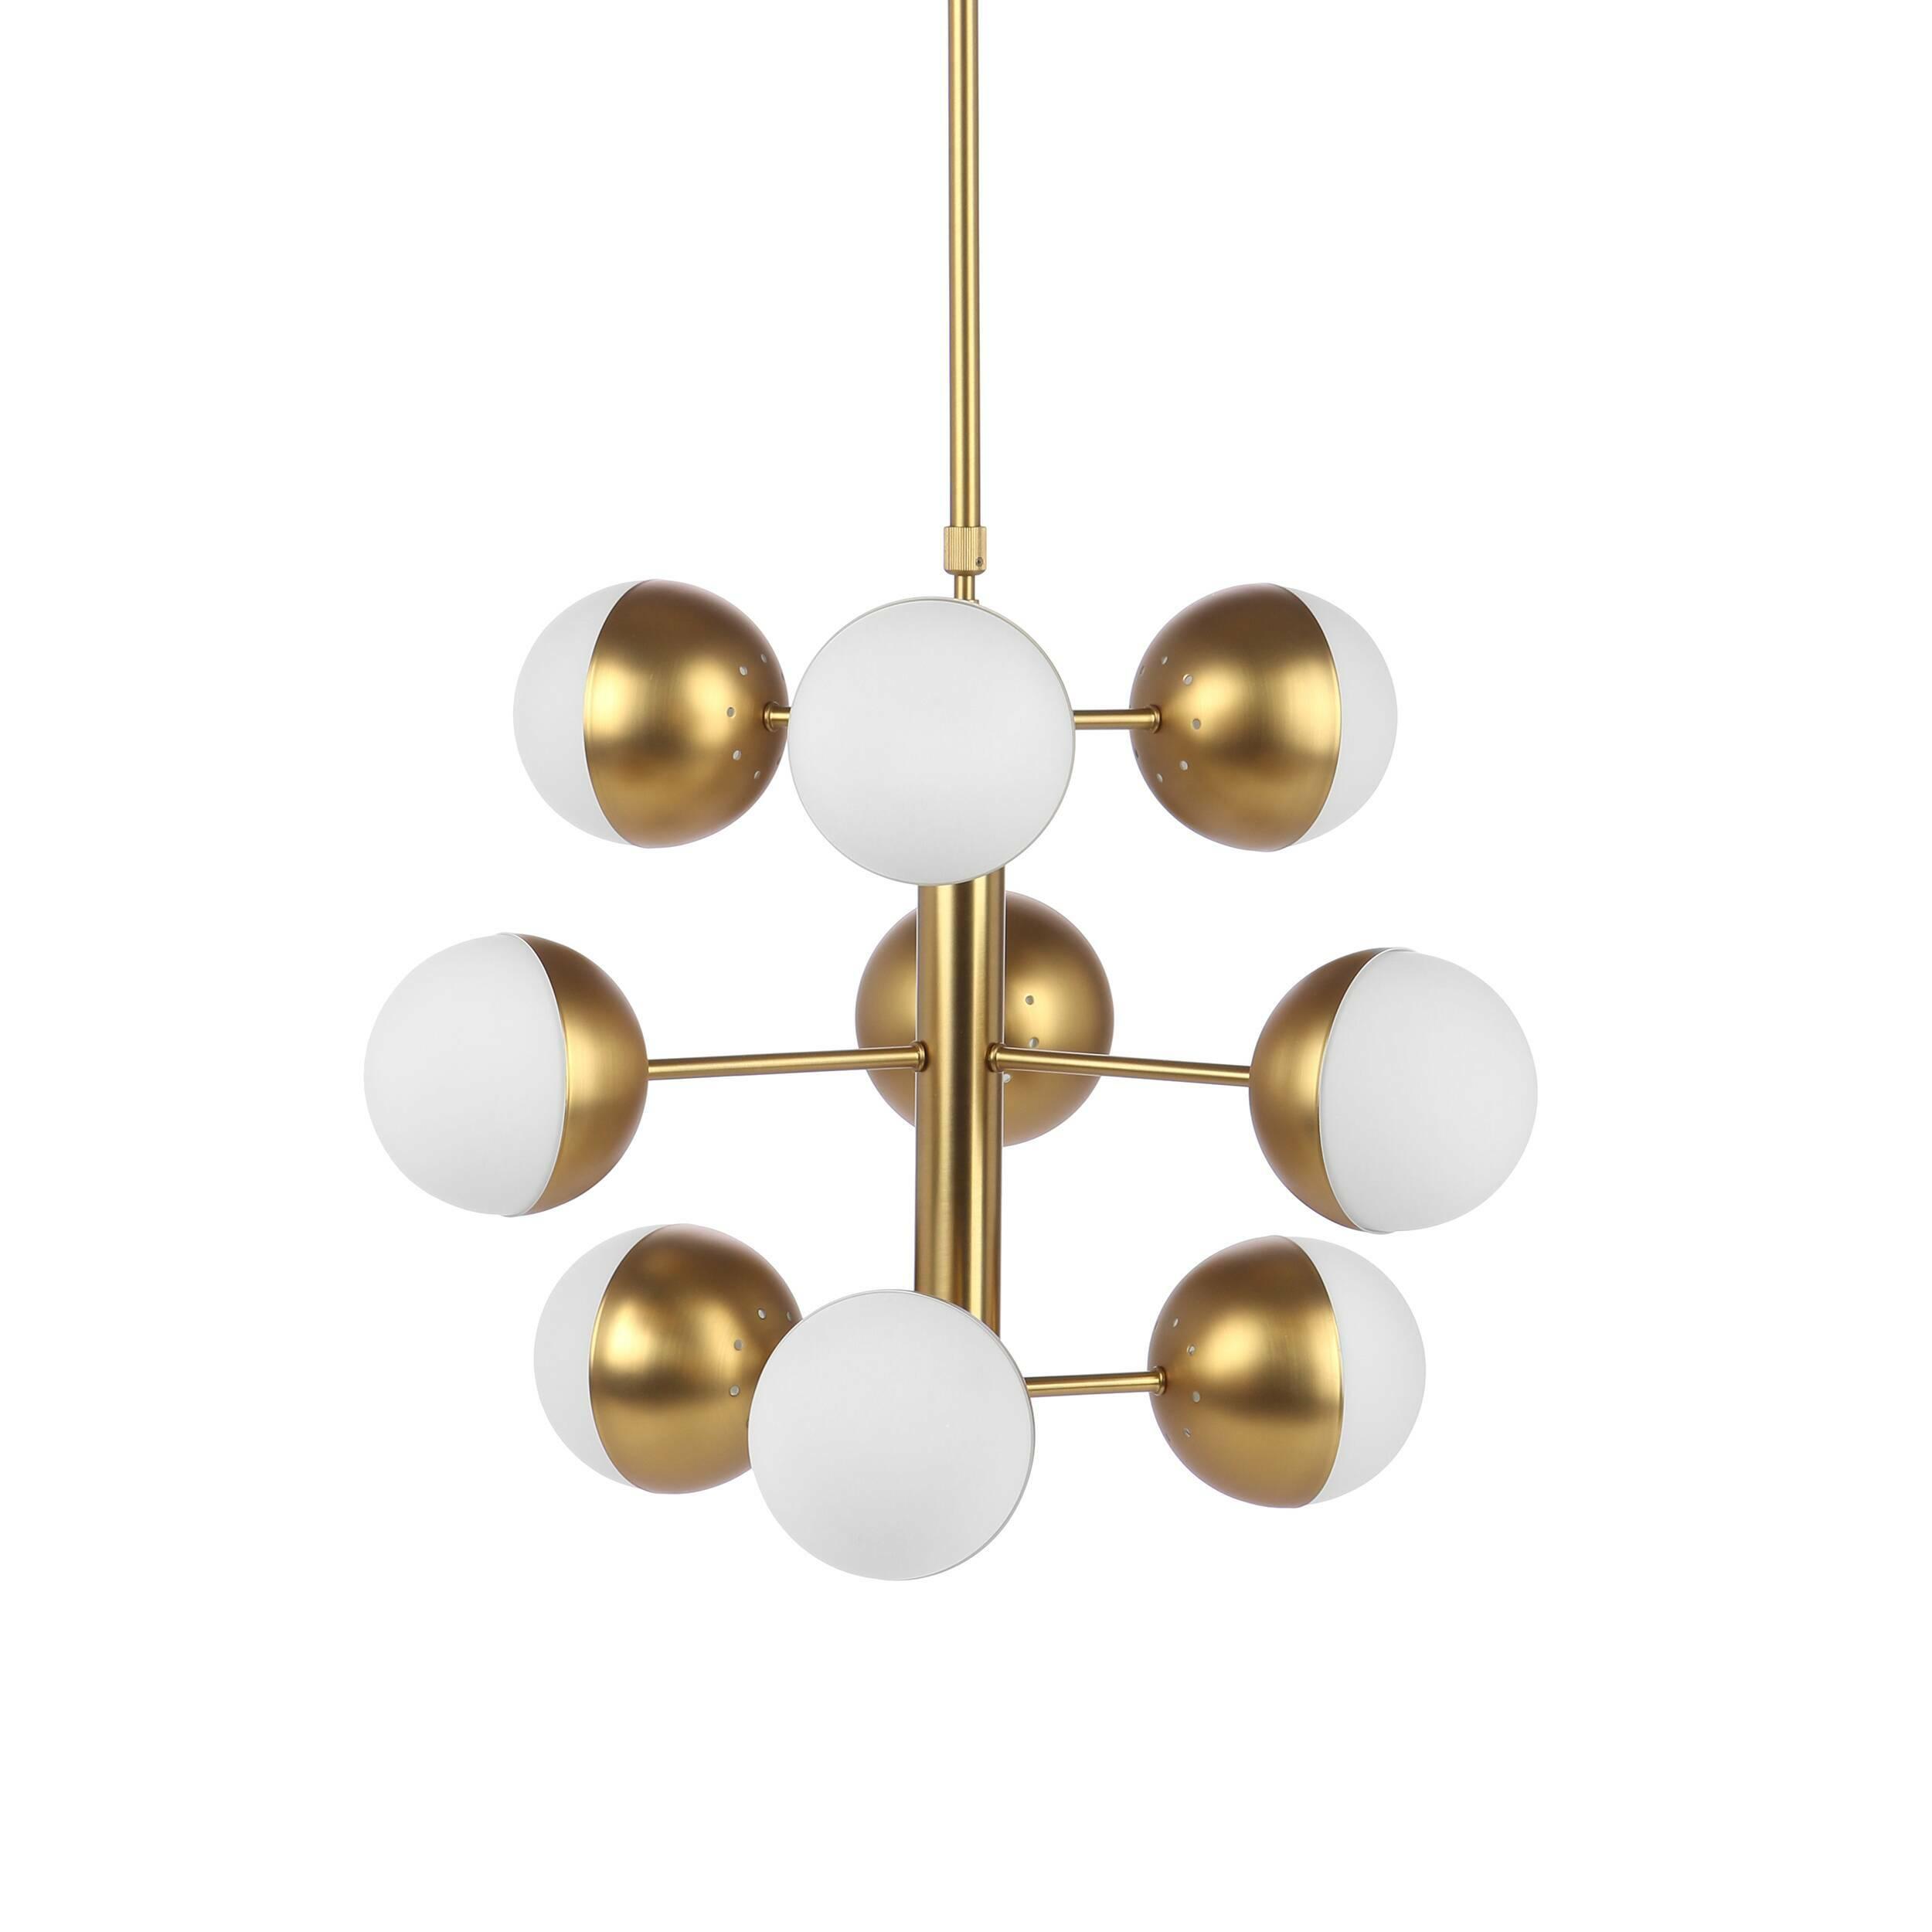 Потолочный светильник Italian Globe 9 ламп